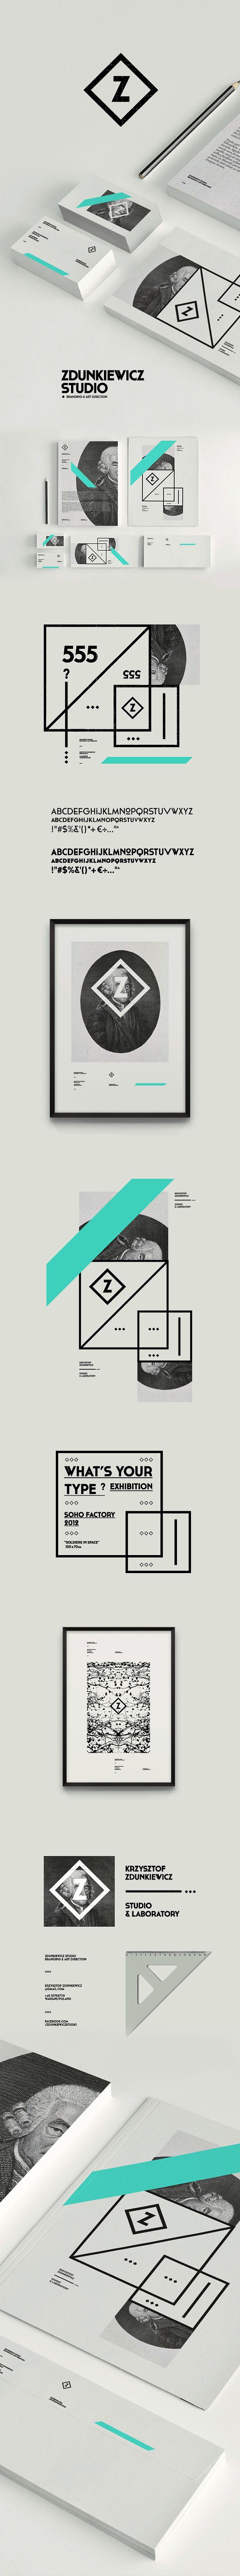 #corporate #identity #design #brand #branding #graphic #id #logo Zdunkiewicz #Studio / #Self # Promotion on #Behance